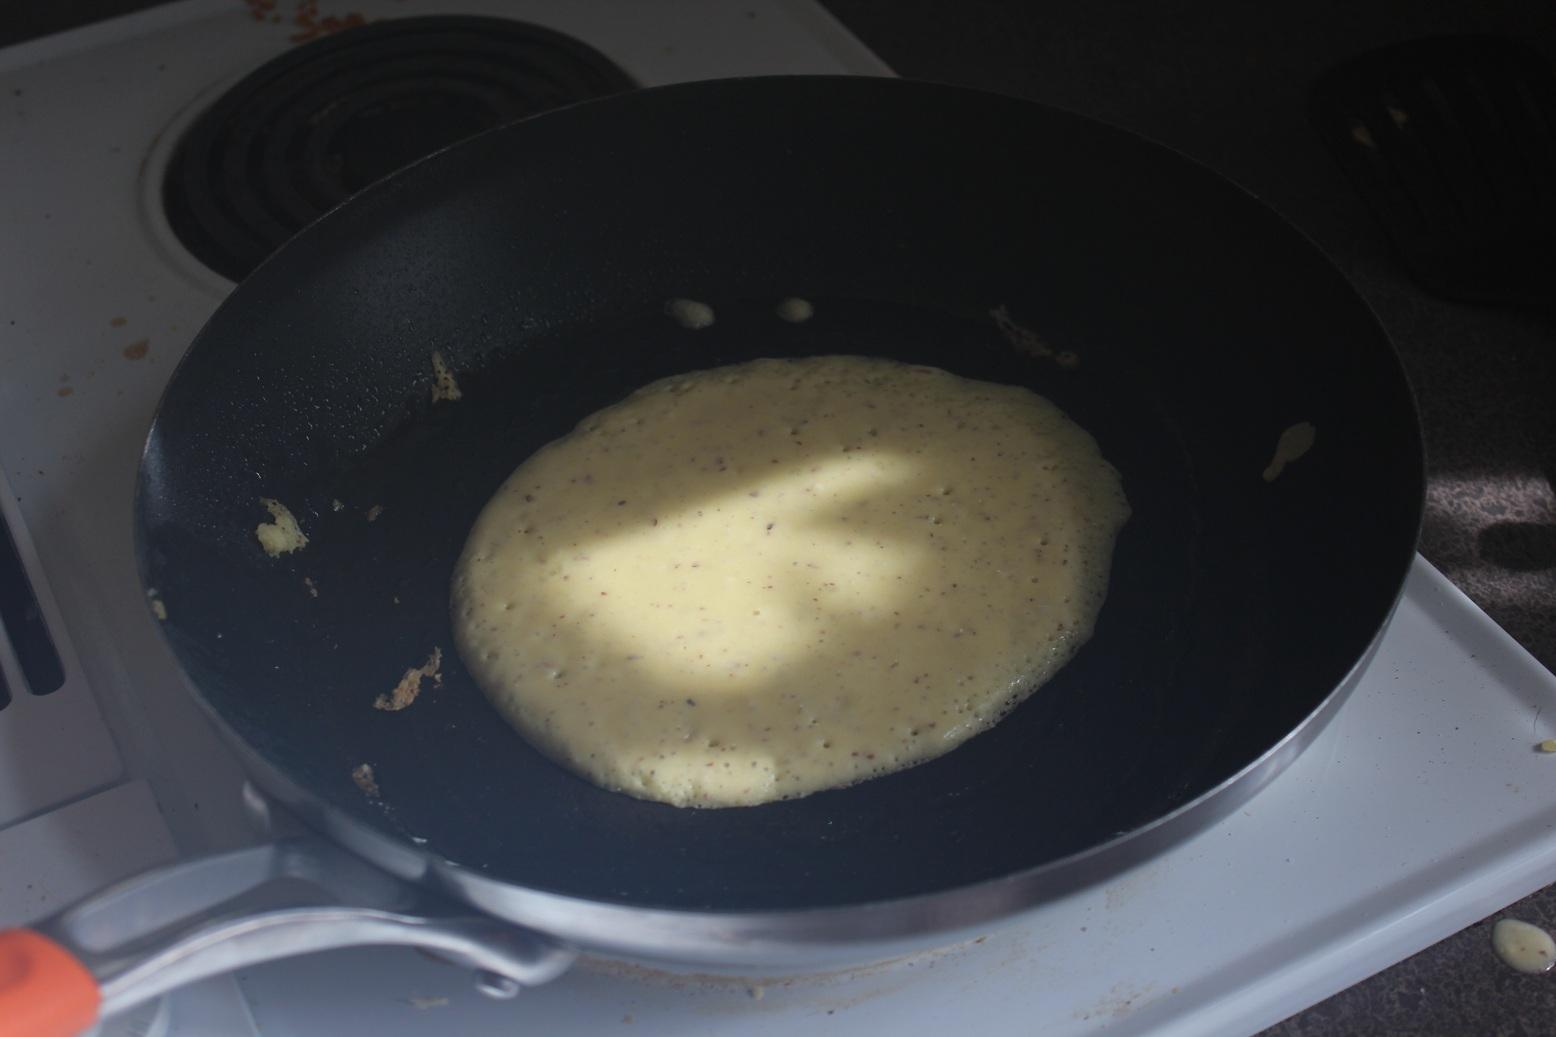 Best Crepe Pan America S Test Kitchen